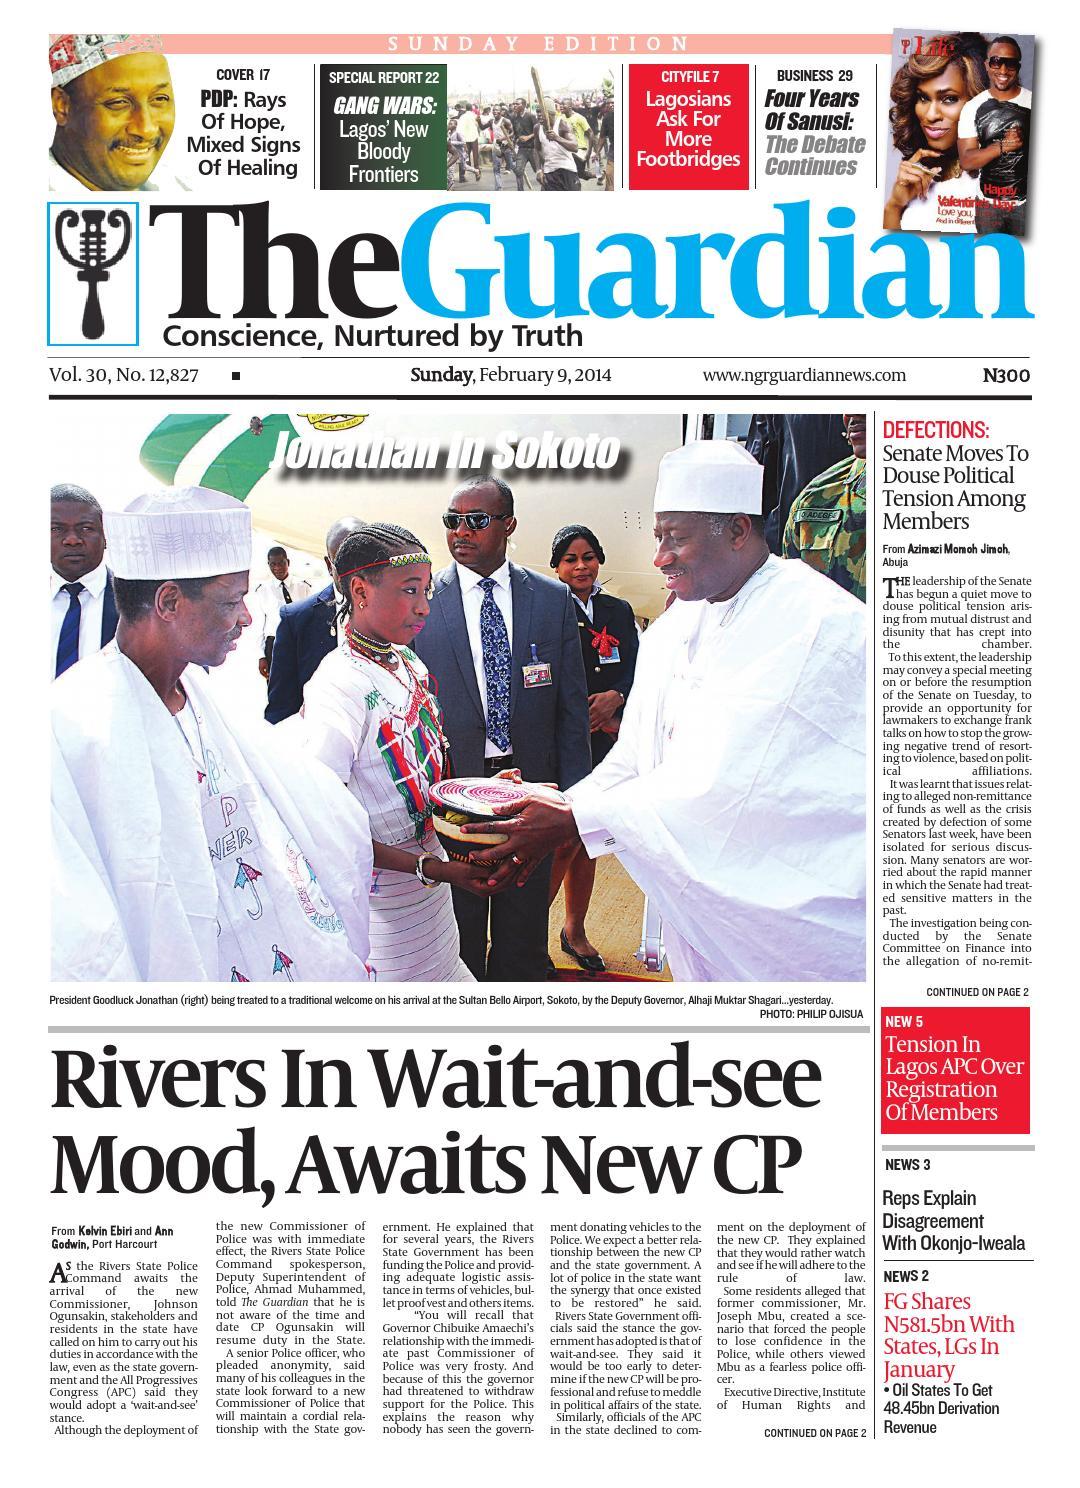 SUN 09 Feb 2014 by The Guardian Newspaper - issuu